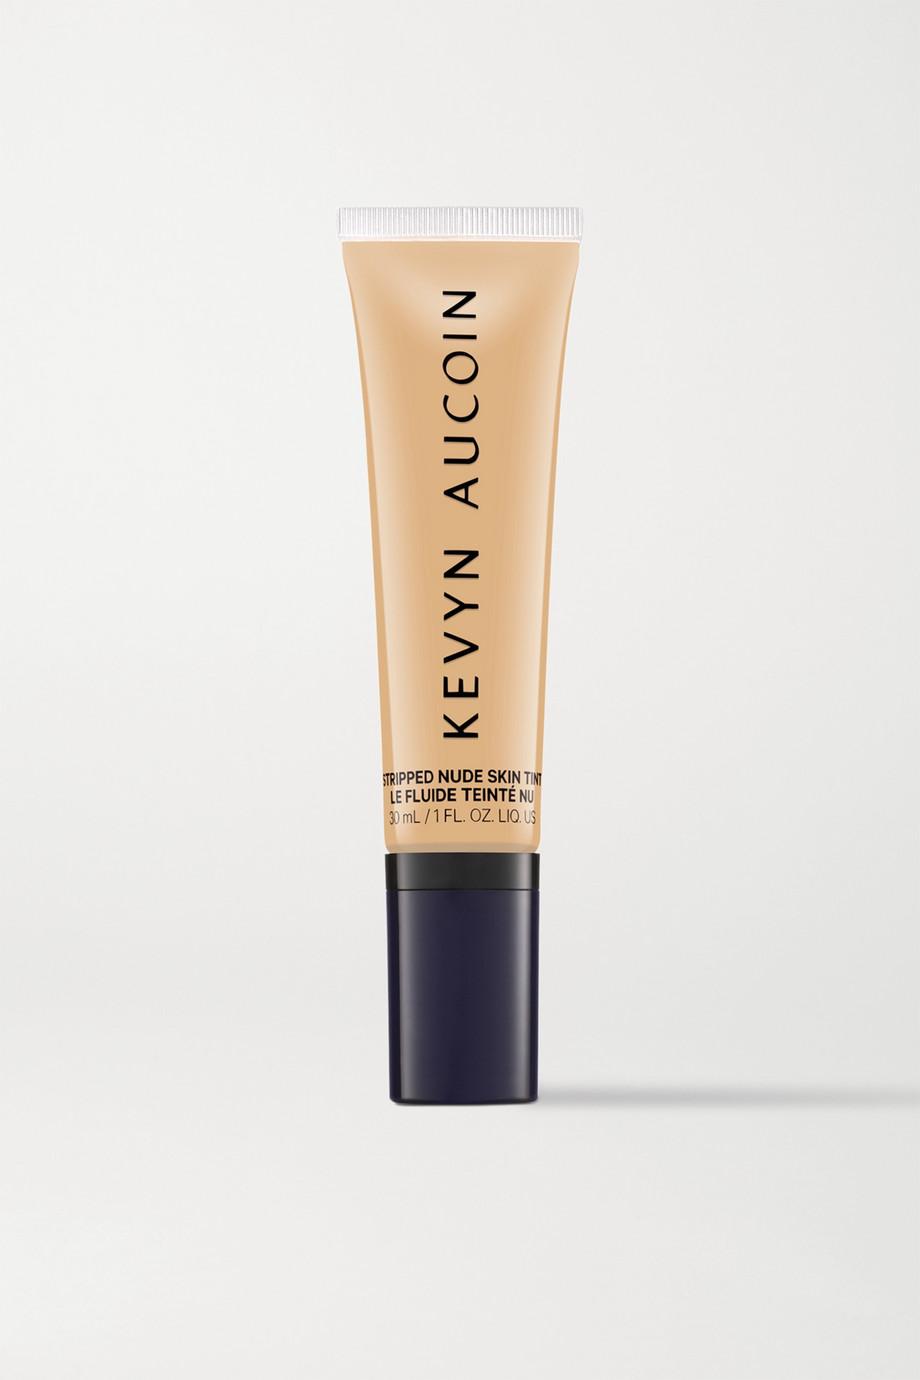 Kevyn Aucoin Stripped Nude Skin Tint - Medium 05, 30ml